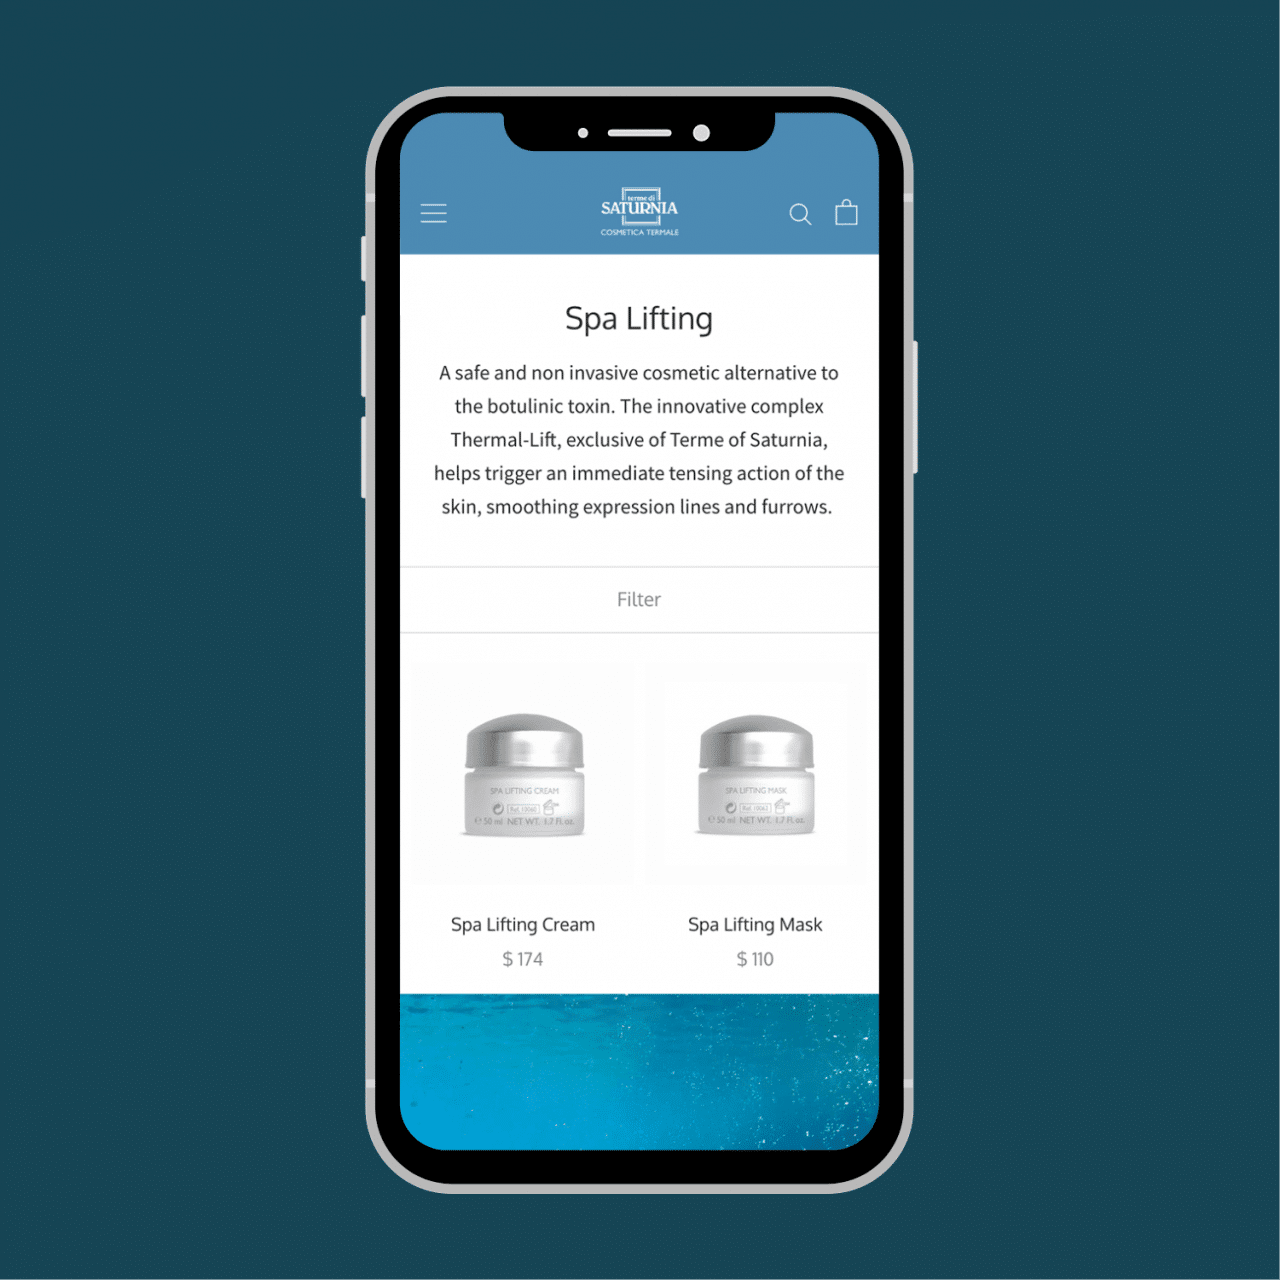 Boutique en ligne - Shopify Partner